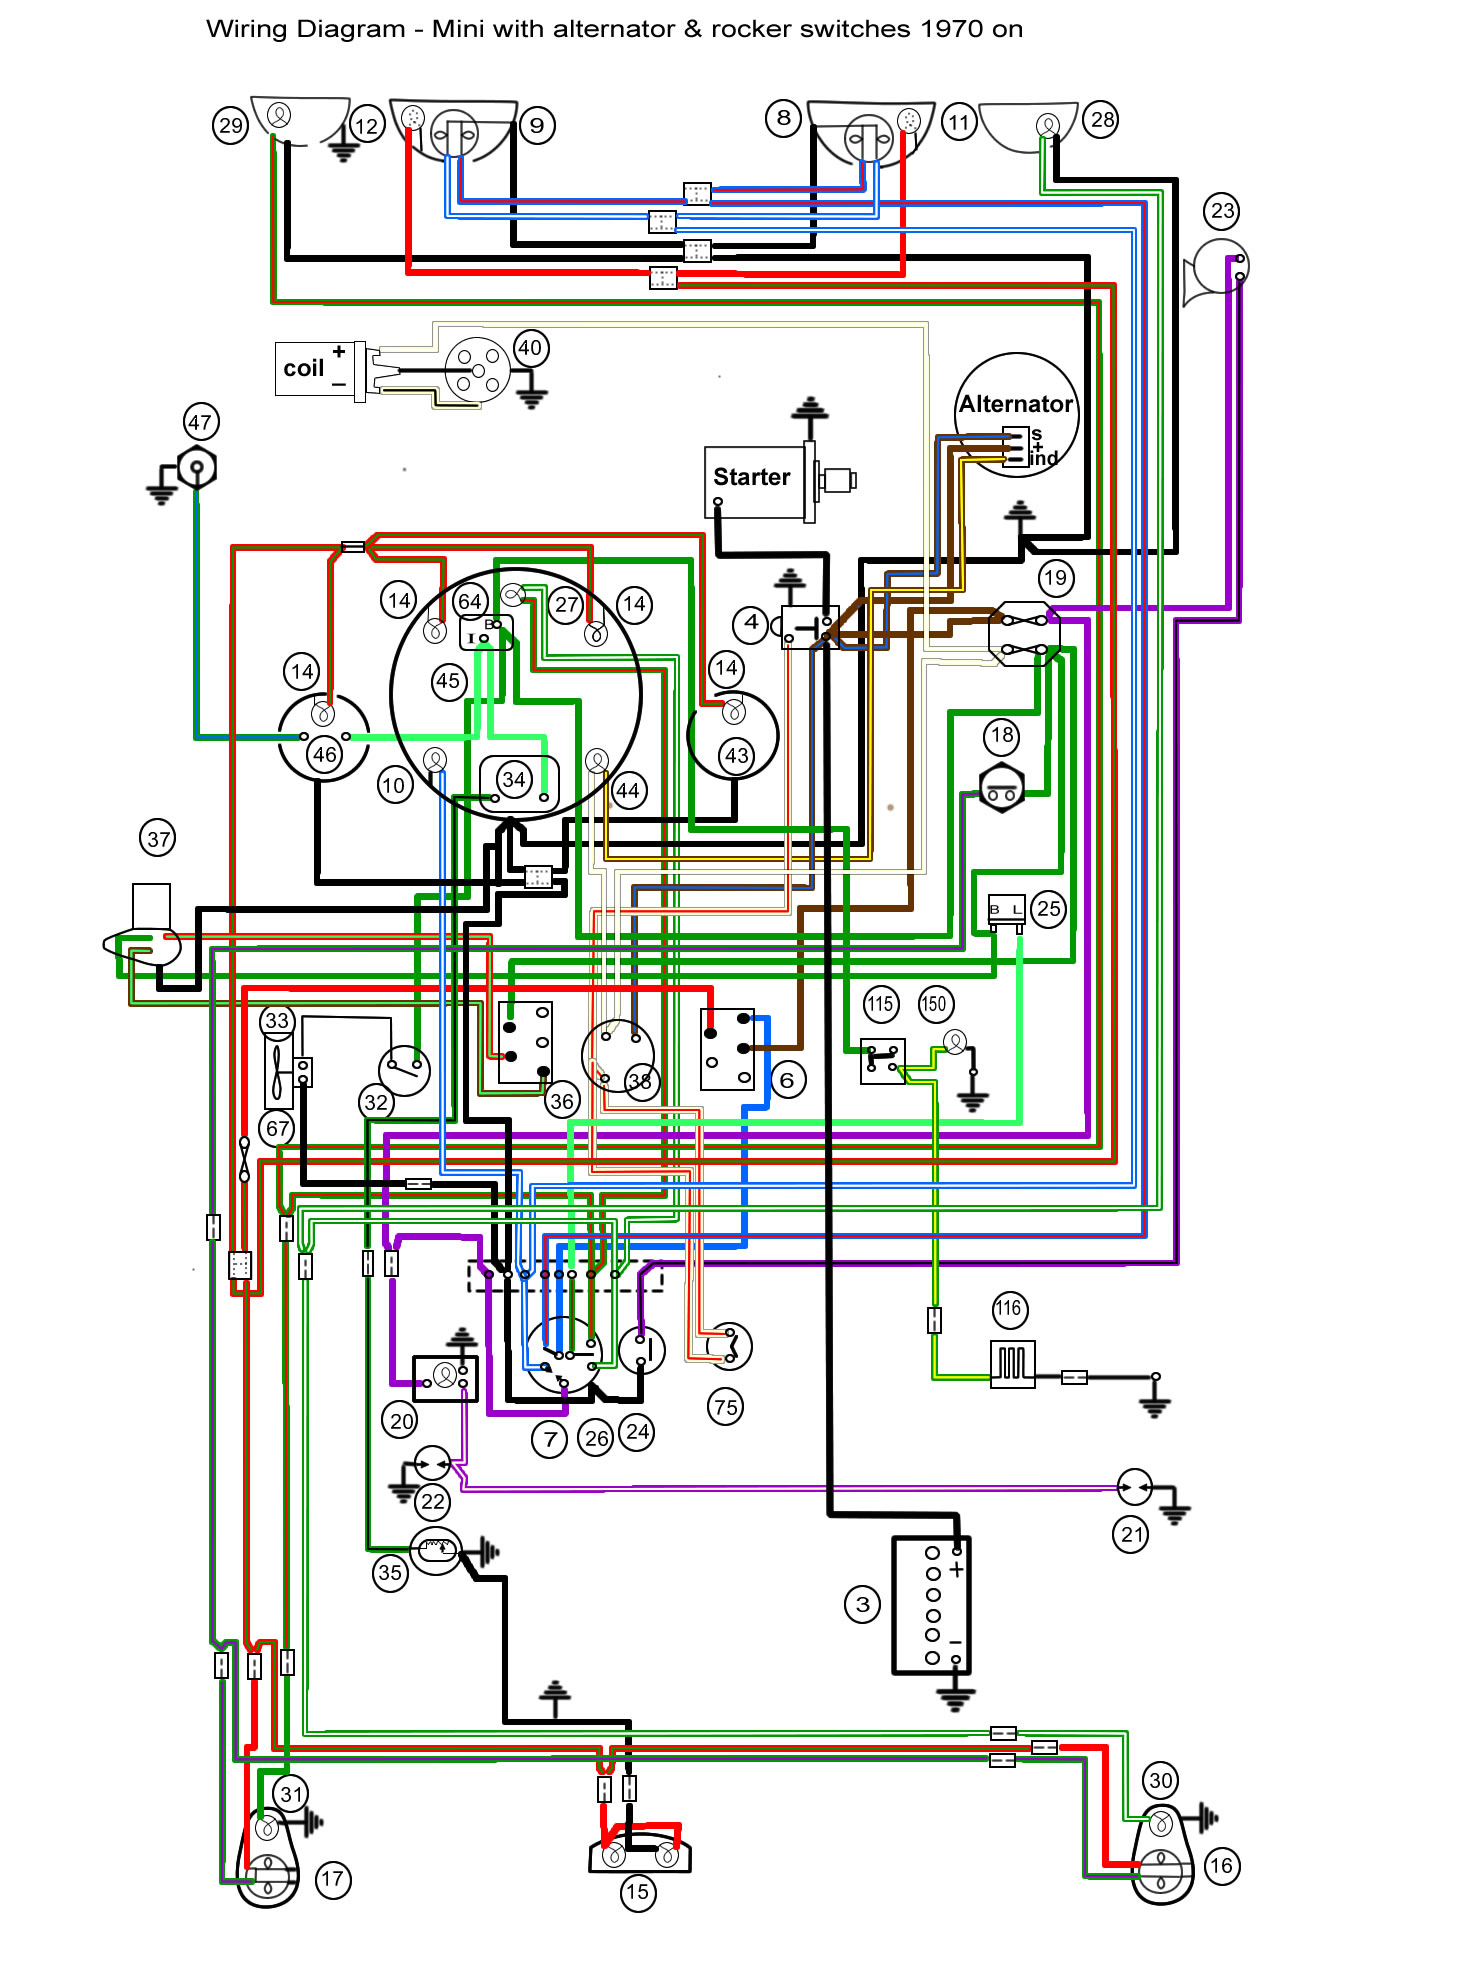 Electrical-ColourWiringDiagram